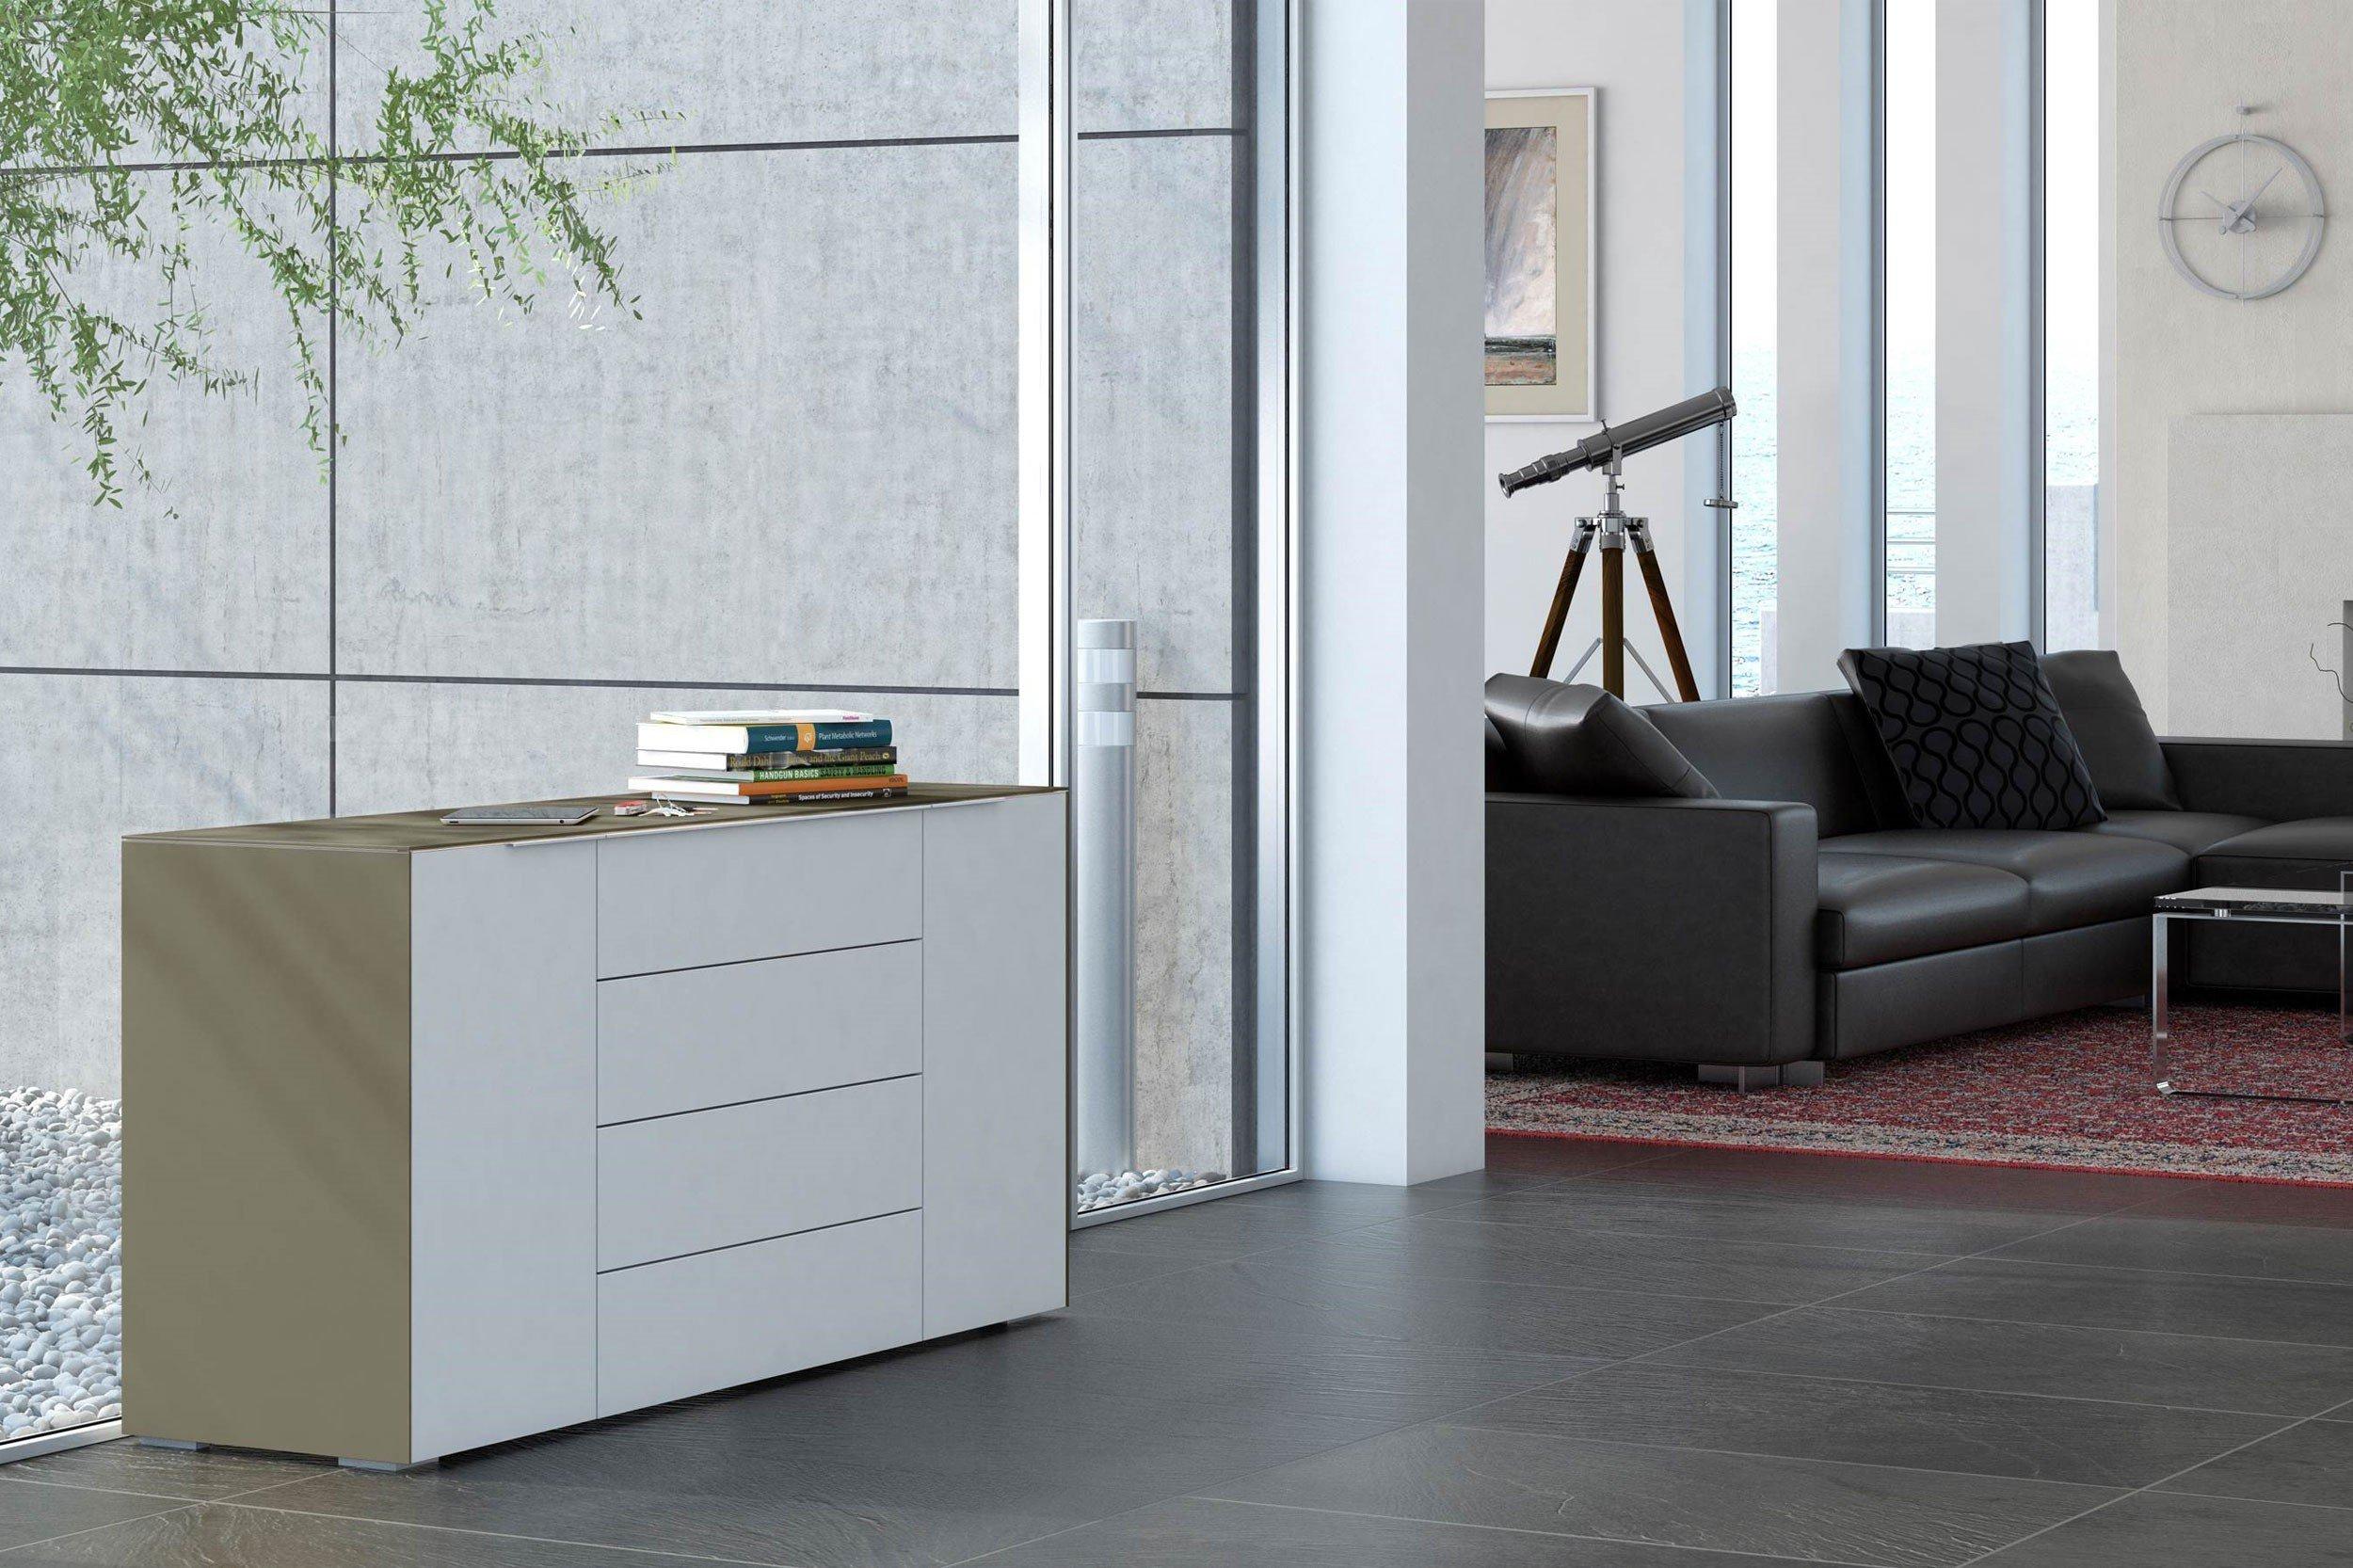 mbel auf raten zahlen amazing kategorie with mbel auf raten zahlen simple mbel auf rechnung. Black Bedroom Furniture Sets. Home Design Ideas